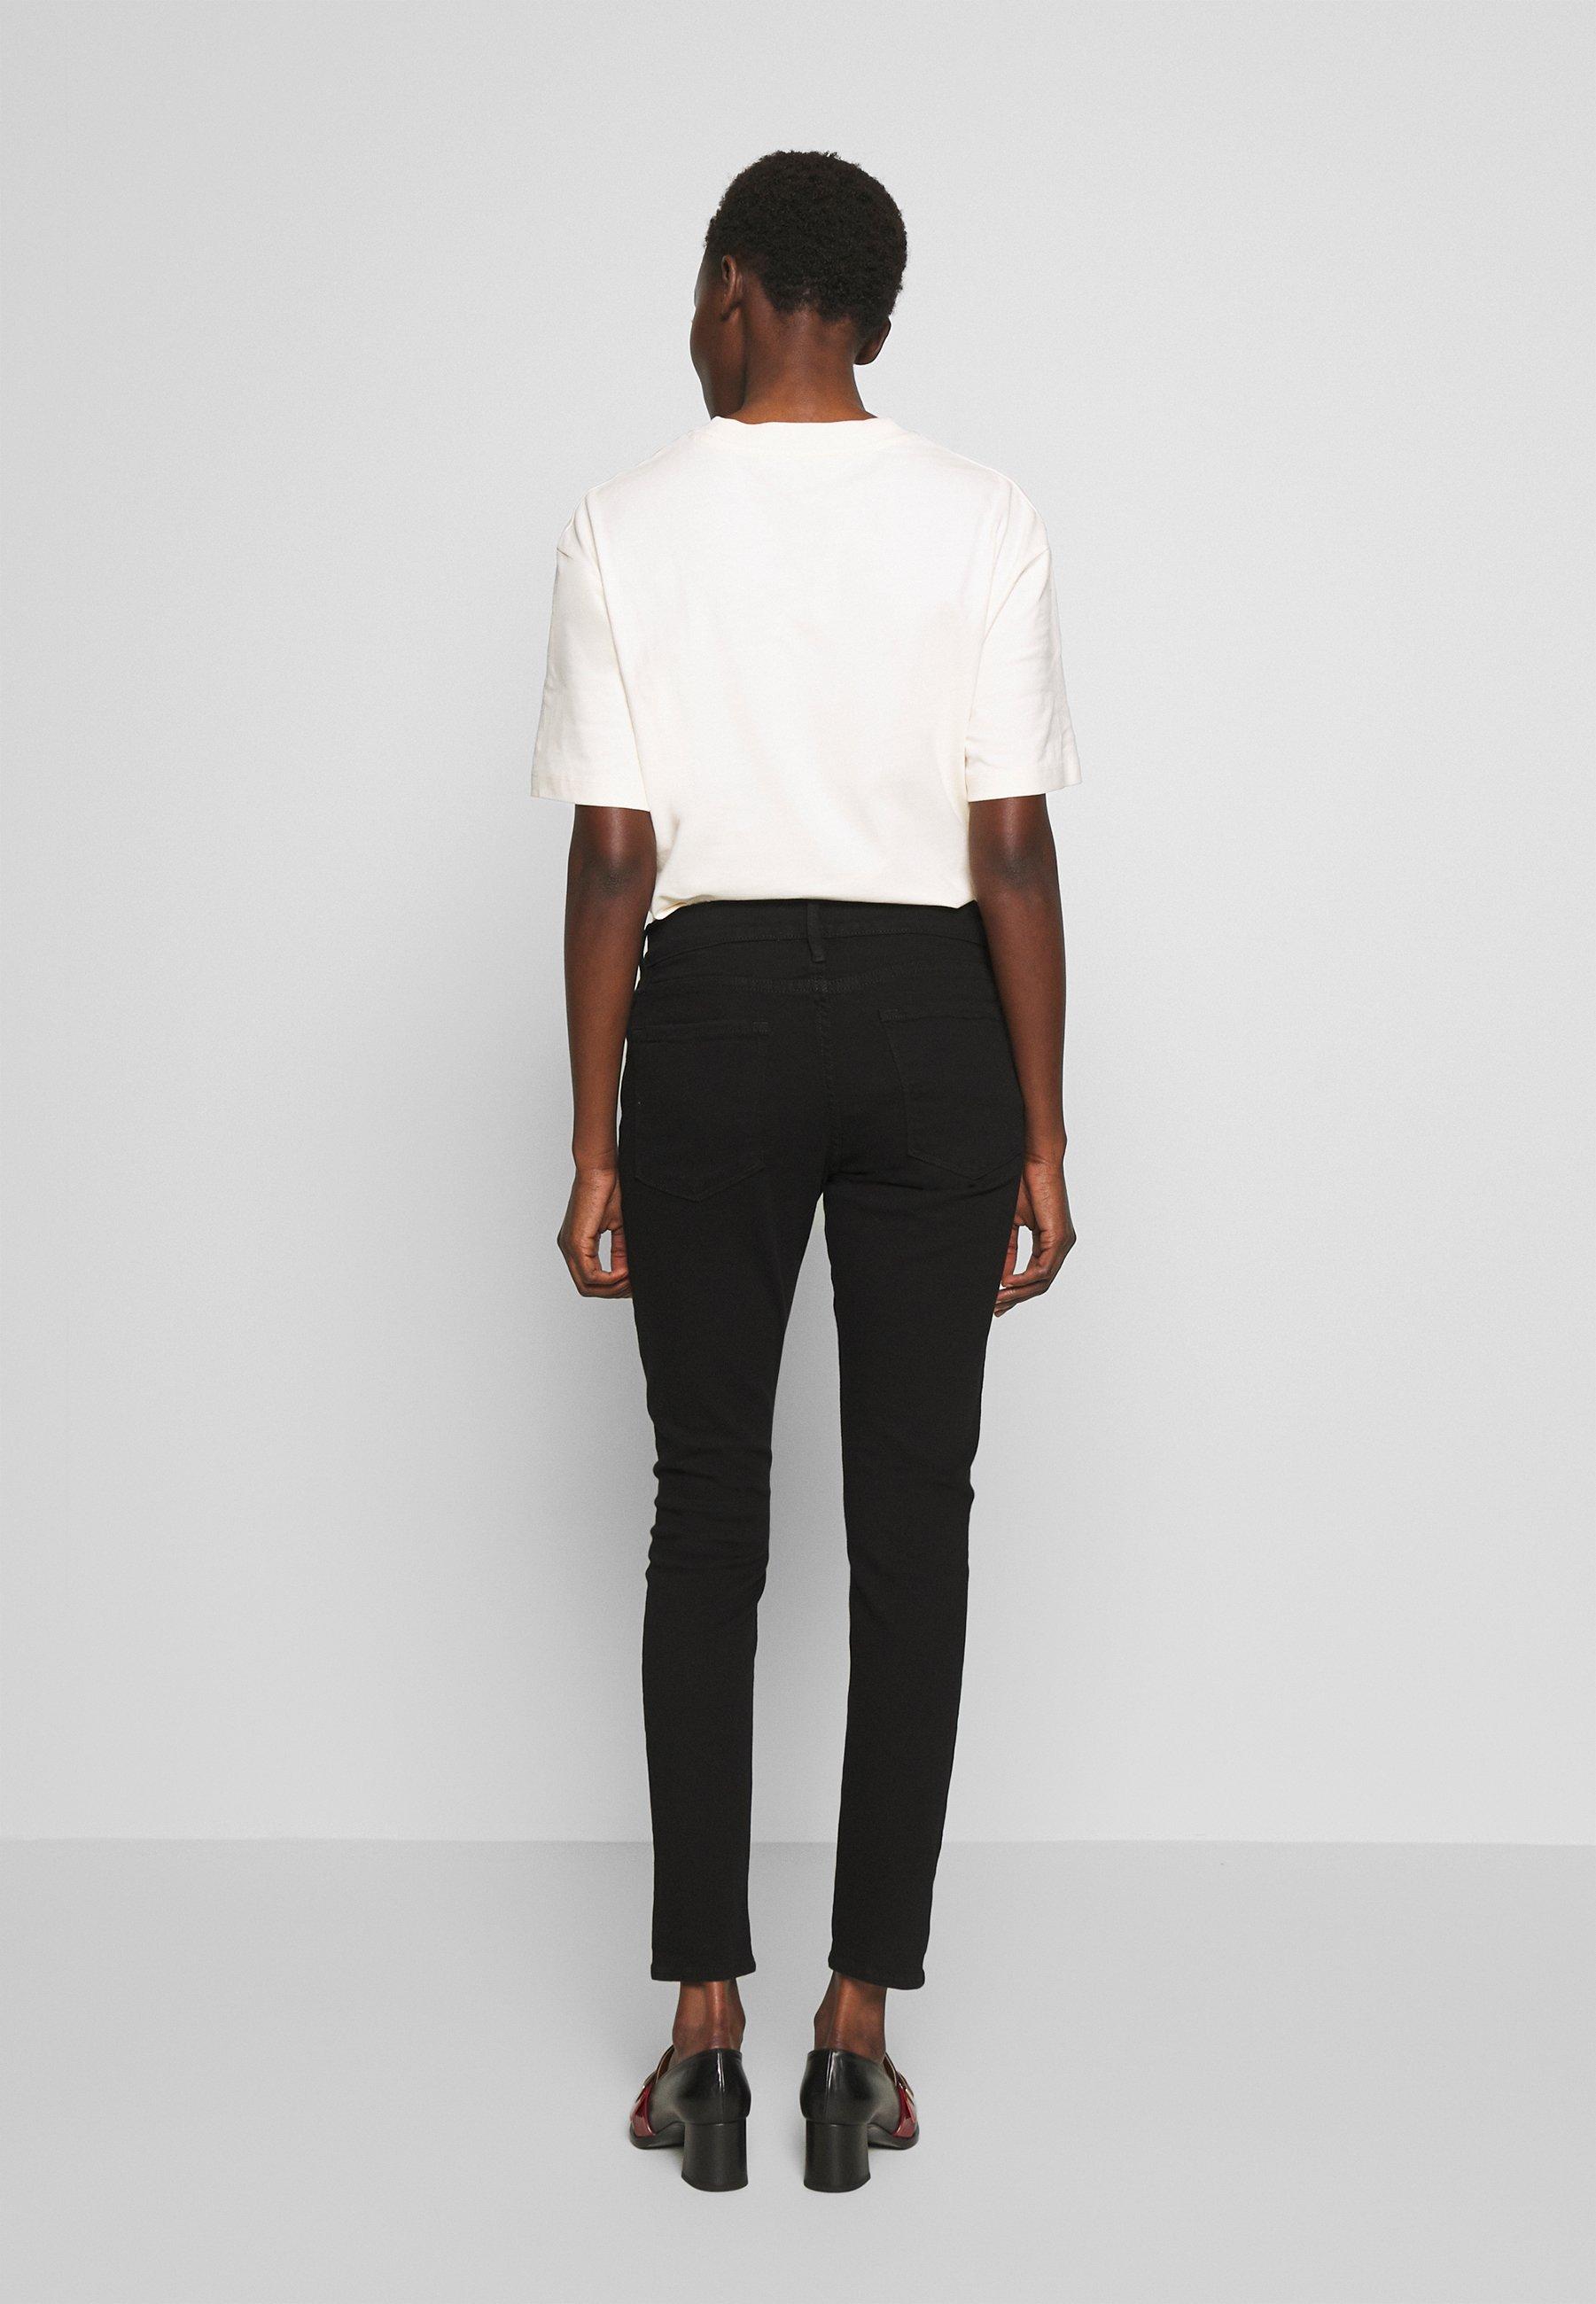 Low Cost Women's Clothing Frame Denim LE GARCON  Jeans Skinny Fit noir TA9yVLlqd